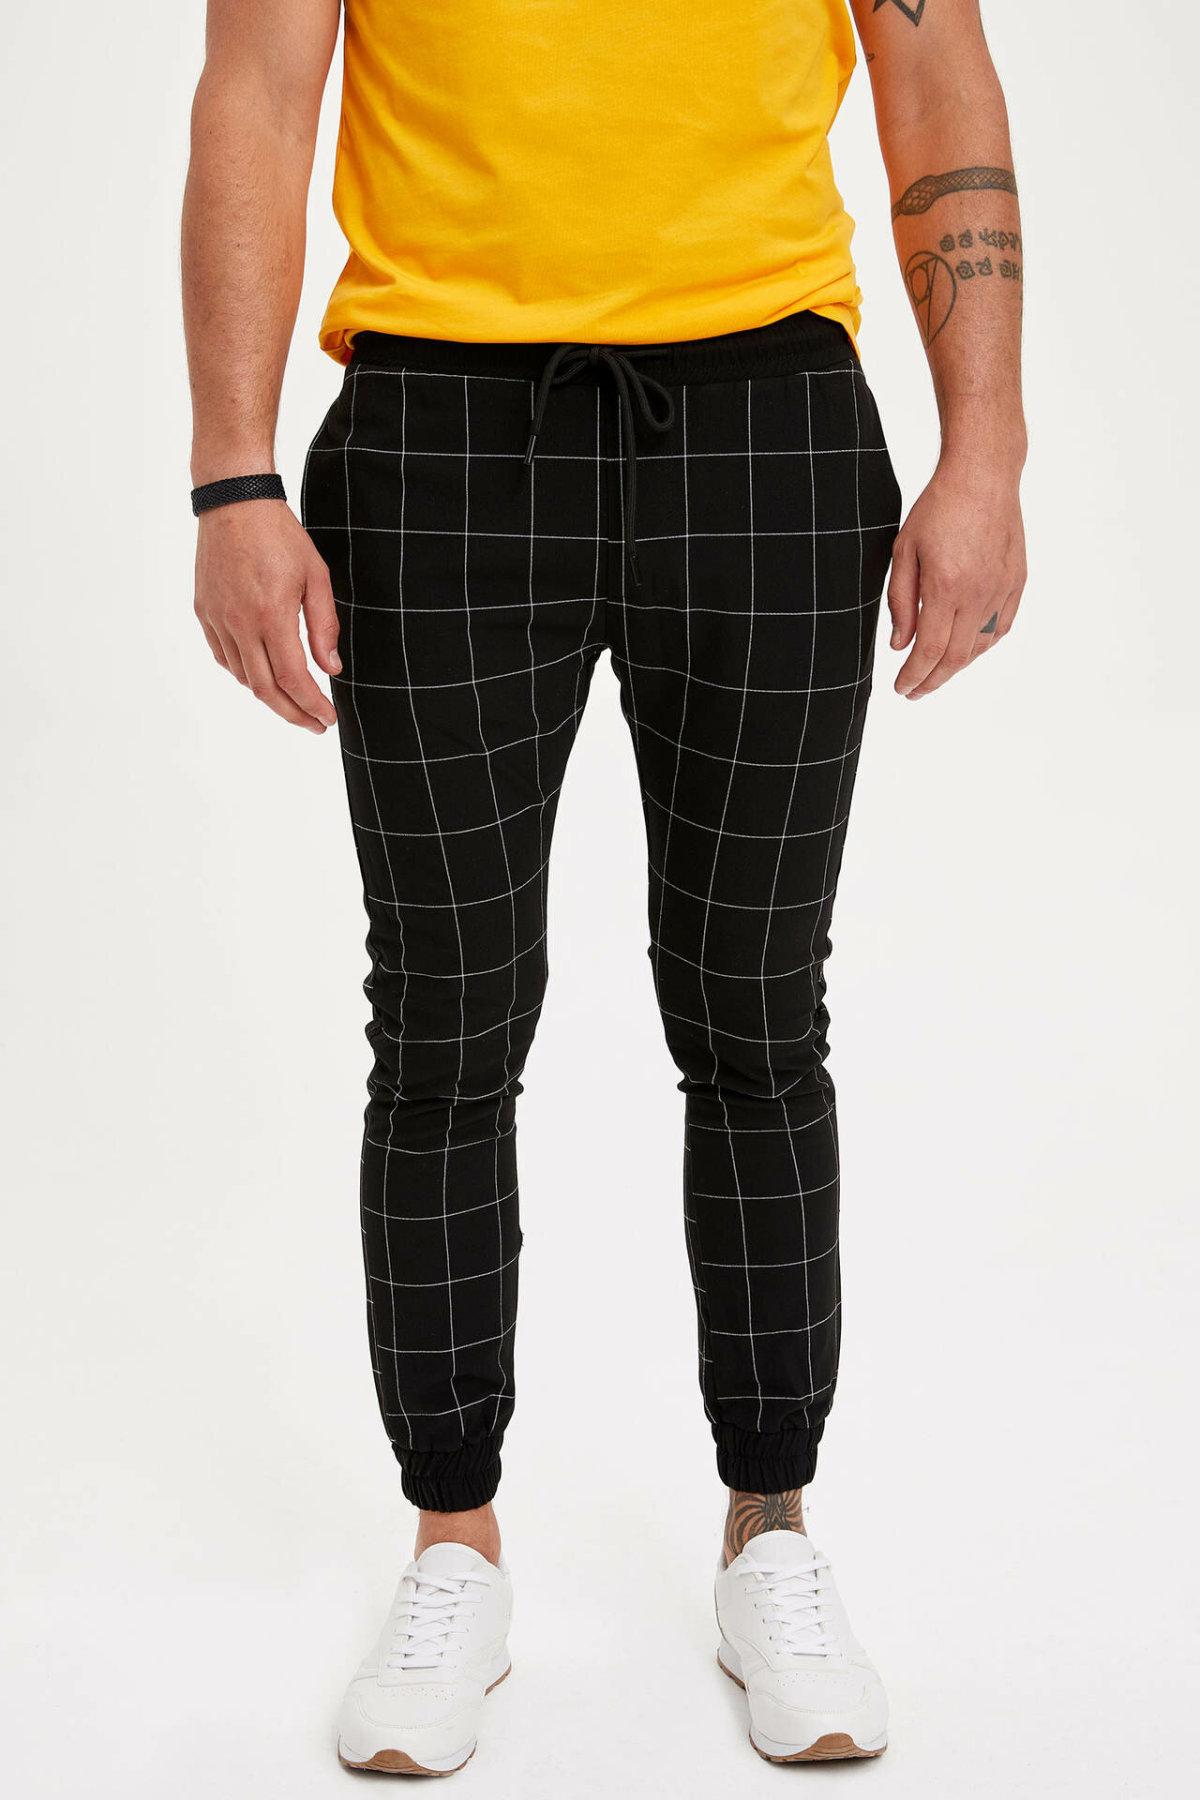 DeFacto Men's Casual Off White Trousers New Fashion Slim Fit Straight Leg Pants Men Brand High Quality Pants L6540AZ19SM